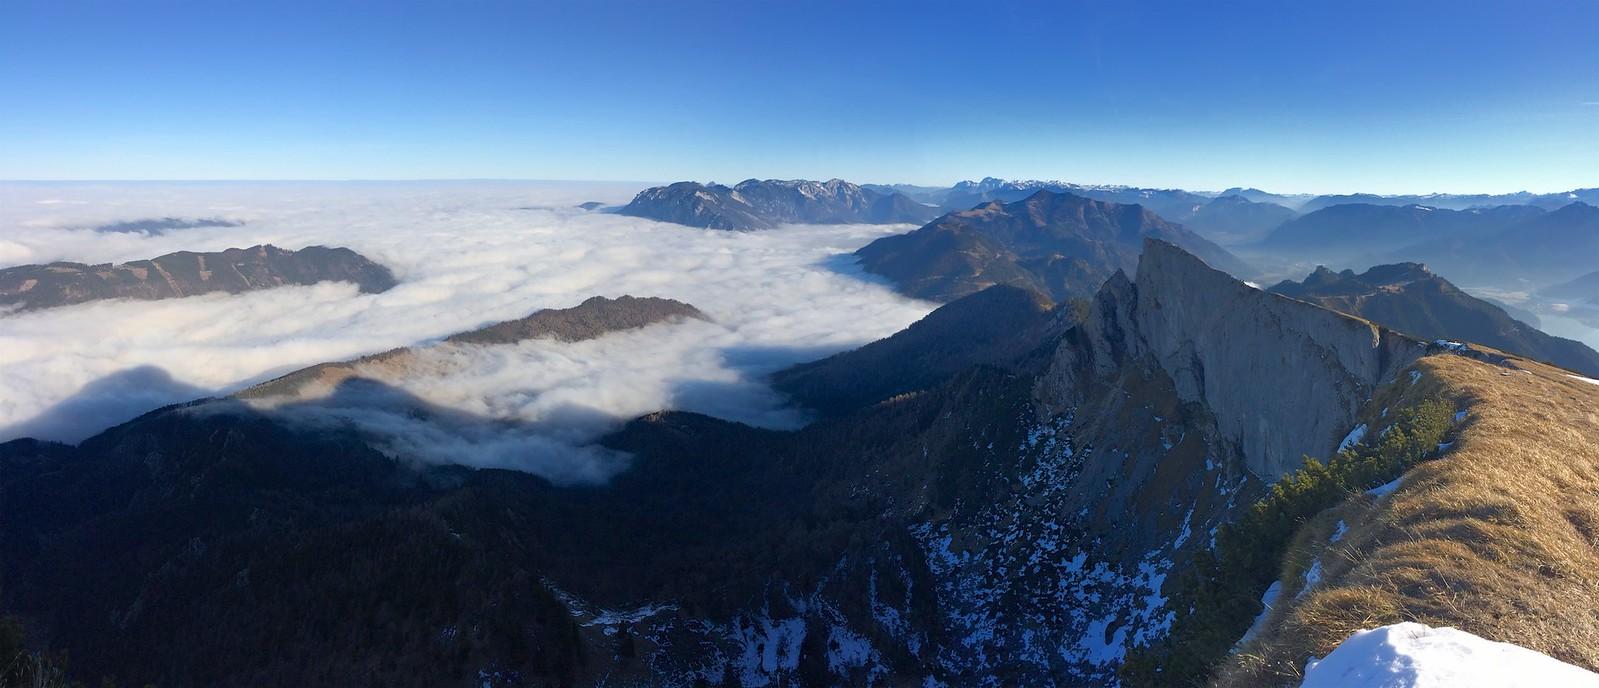 Schafberg panorama na severovýchod k Höllengebirge a Totes Gebirge